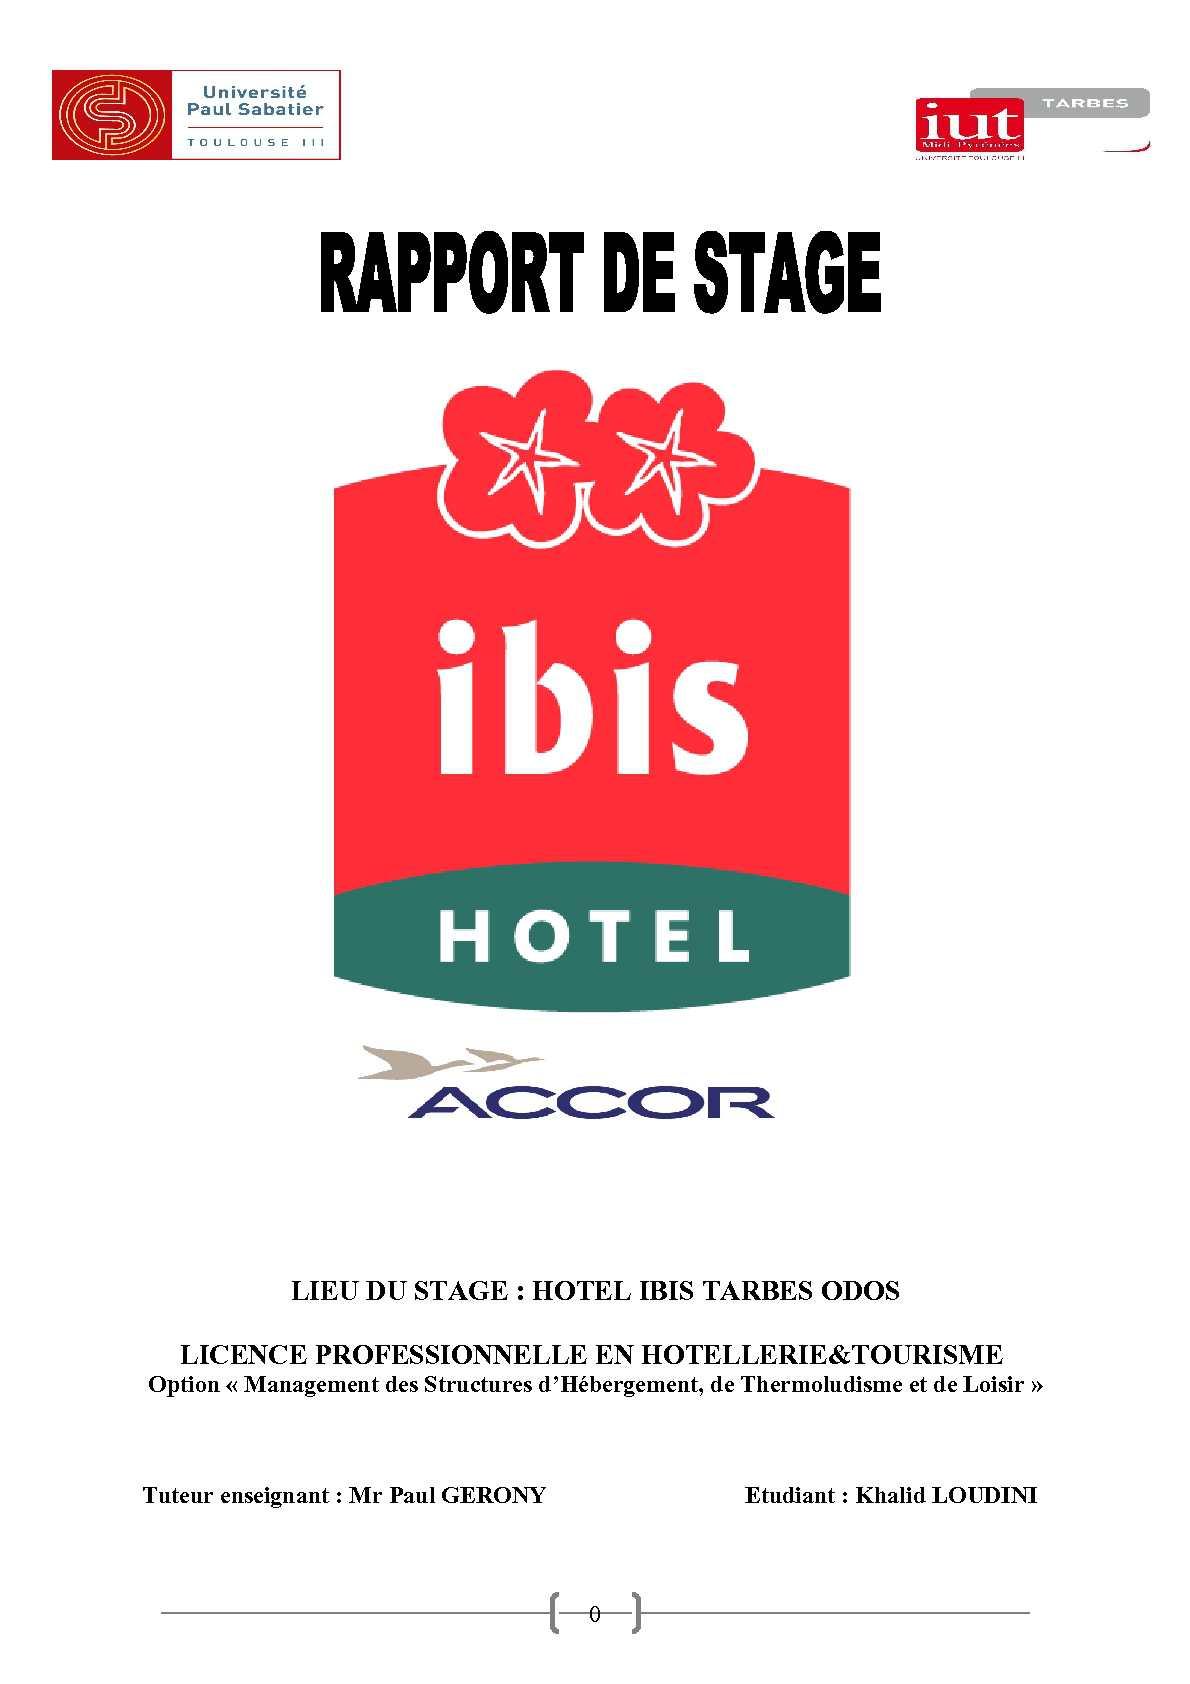 Rapport De Stage Ibis Hôtel Calameo Downloader